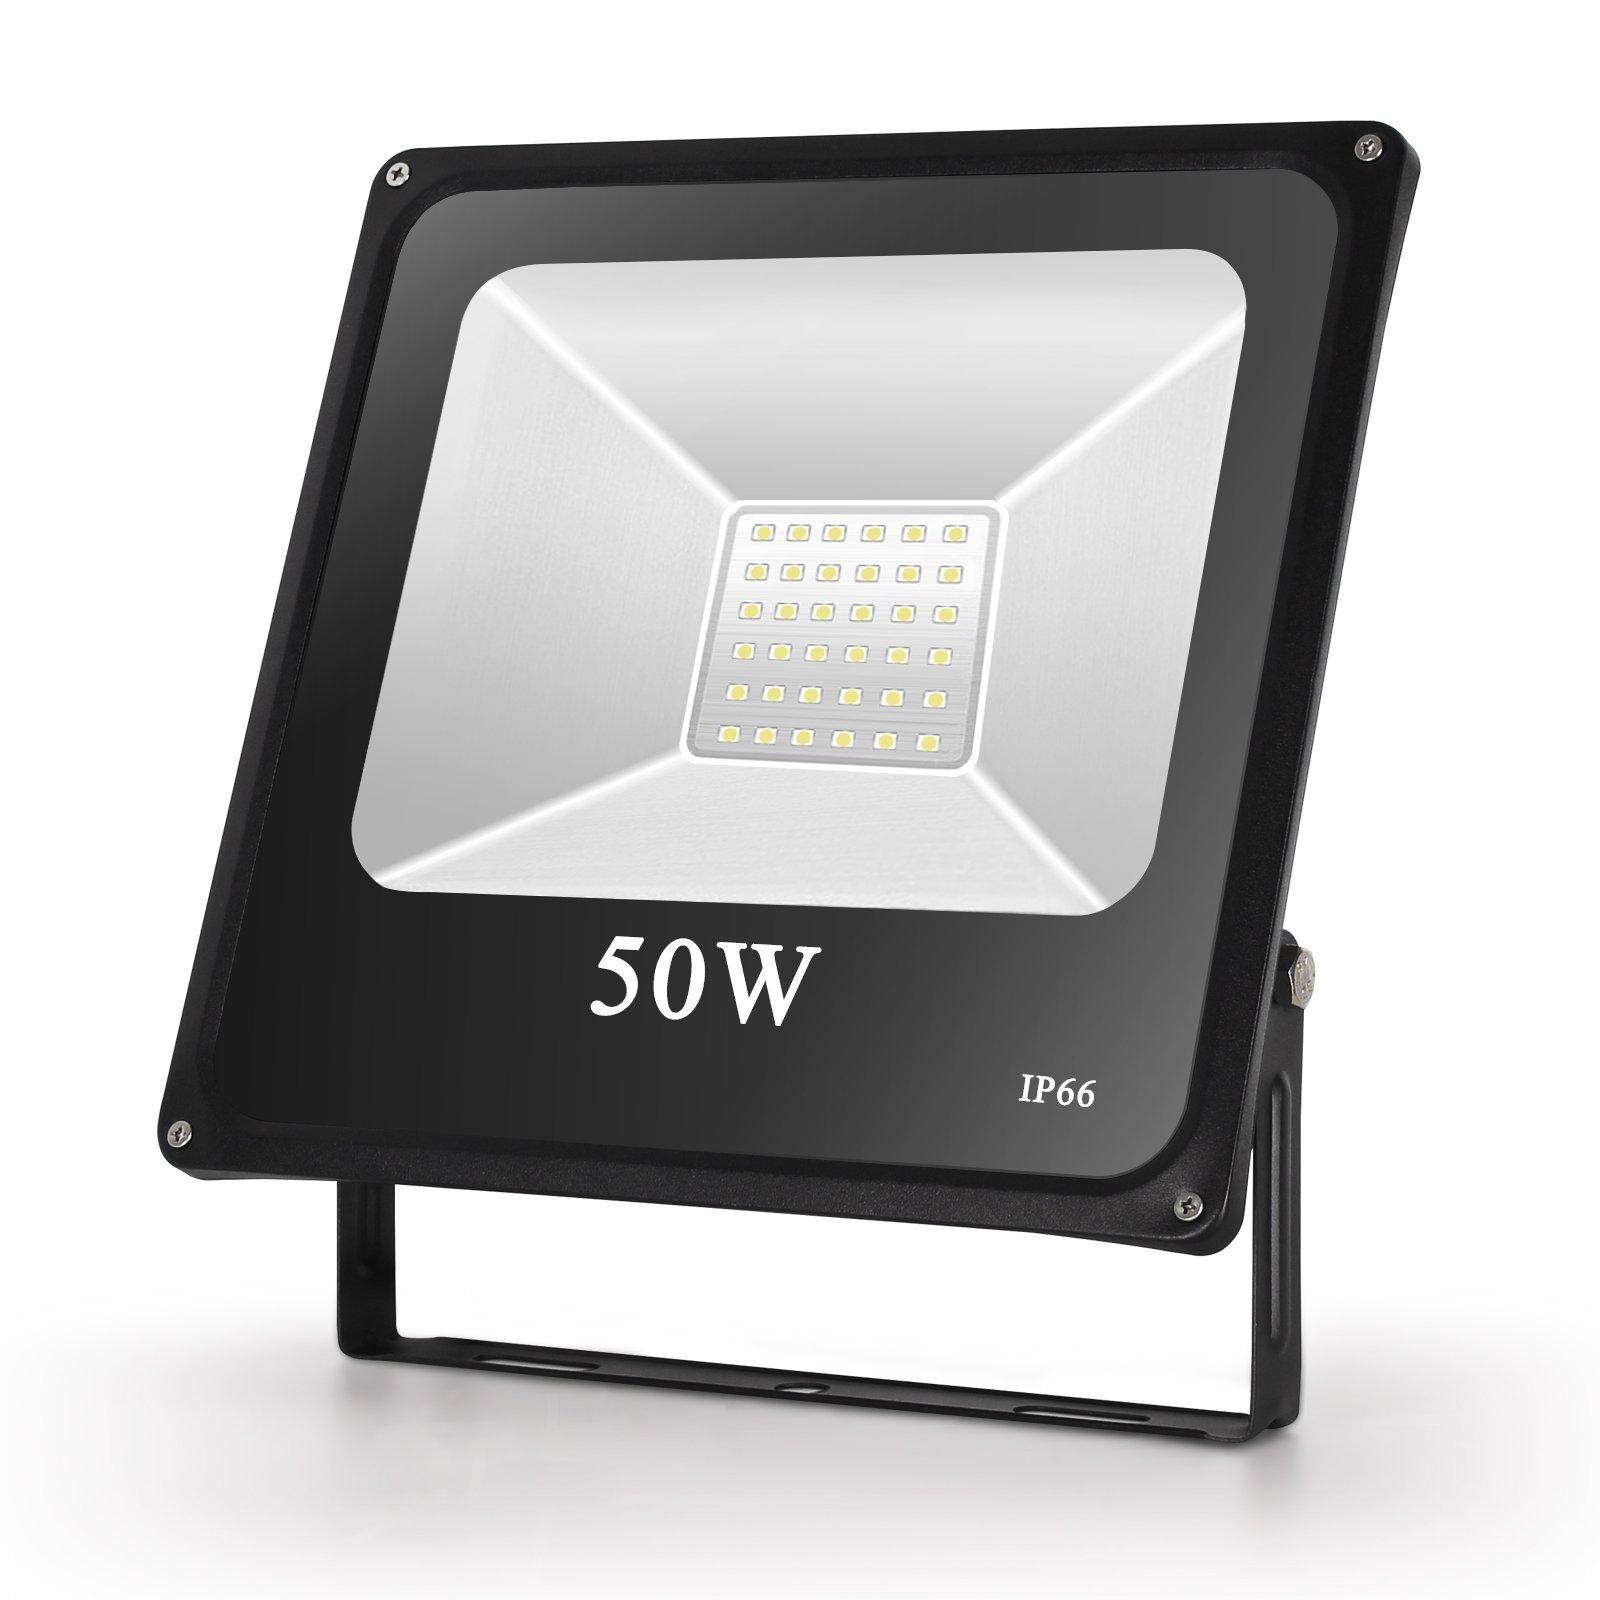 Toplanet 50w Floodlight Led Foco Proyector Led para Exterior Iluminación Decoración 6500k IP66 Negro product image